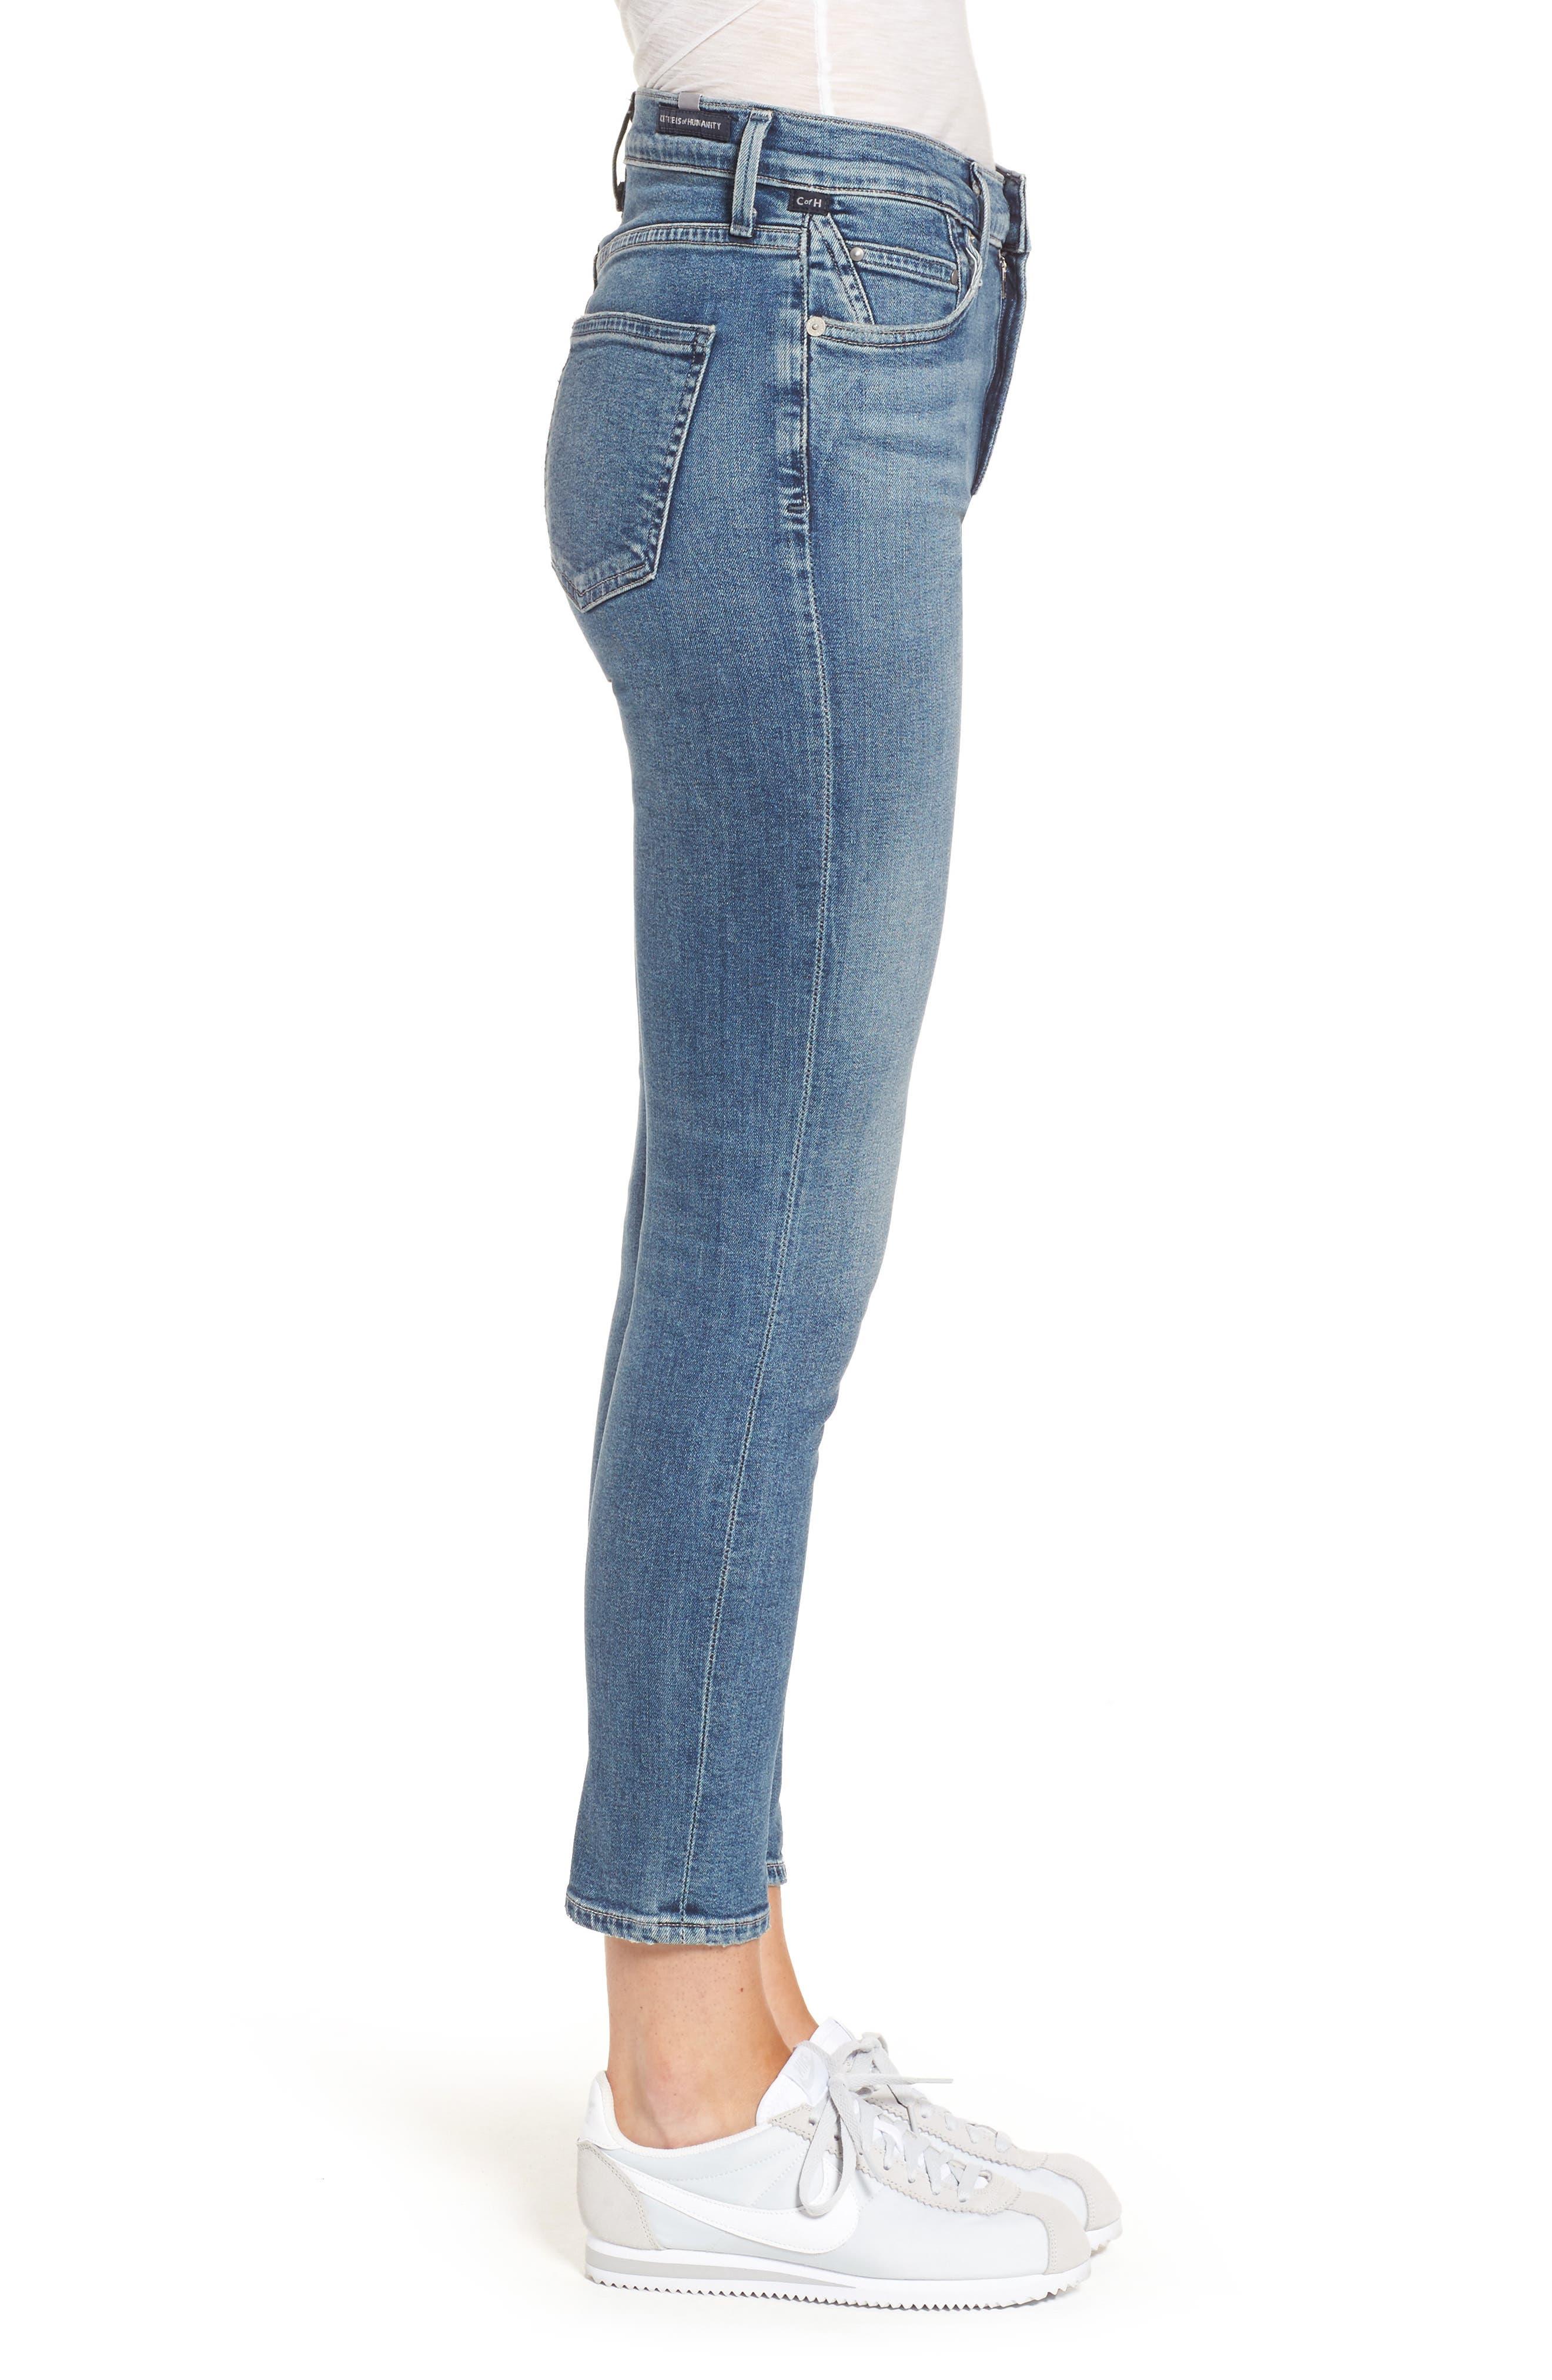 Rocket Crop Skinny Jeans,                             Alternate thumbnail 3, color,